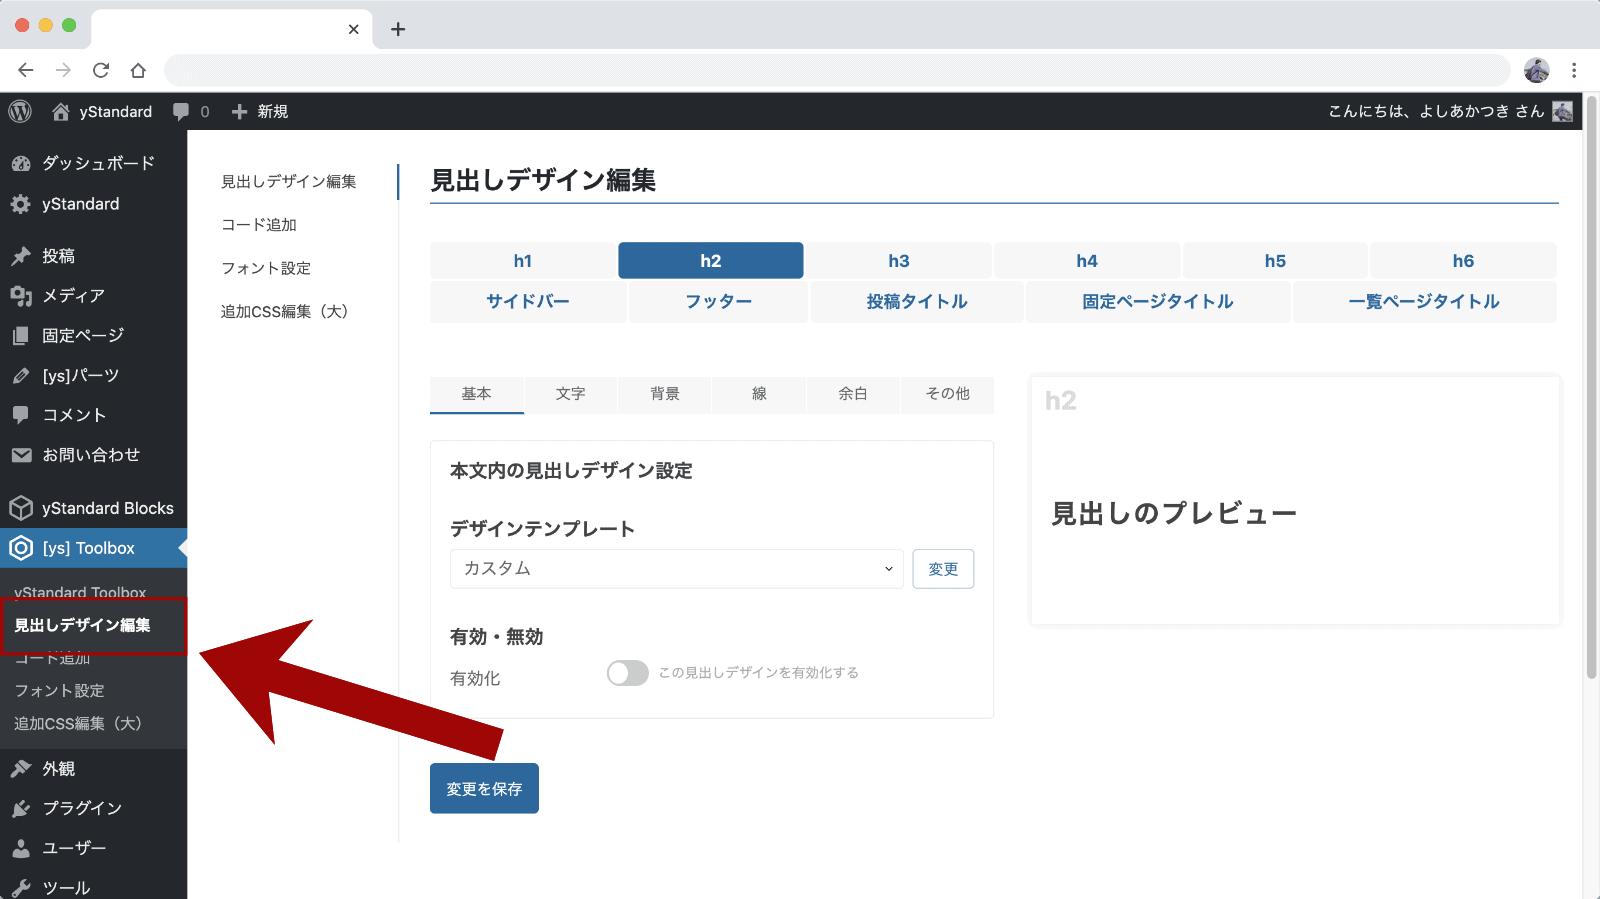 yStandard Toolboxの見出しデザイン編集機能